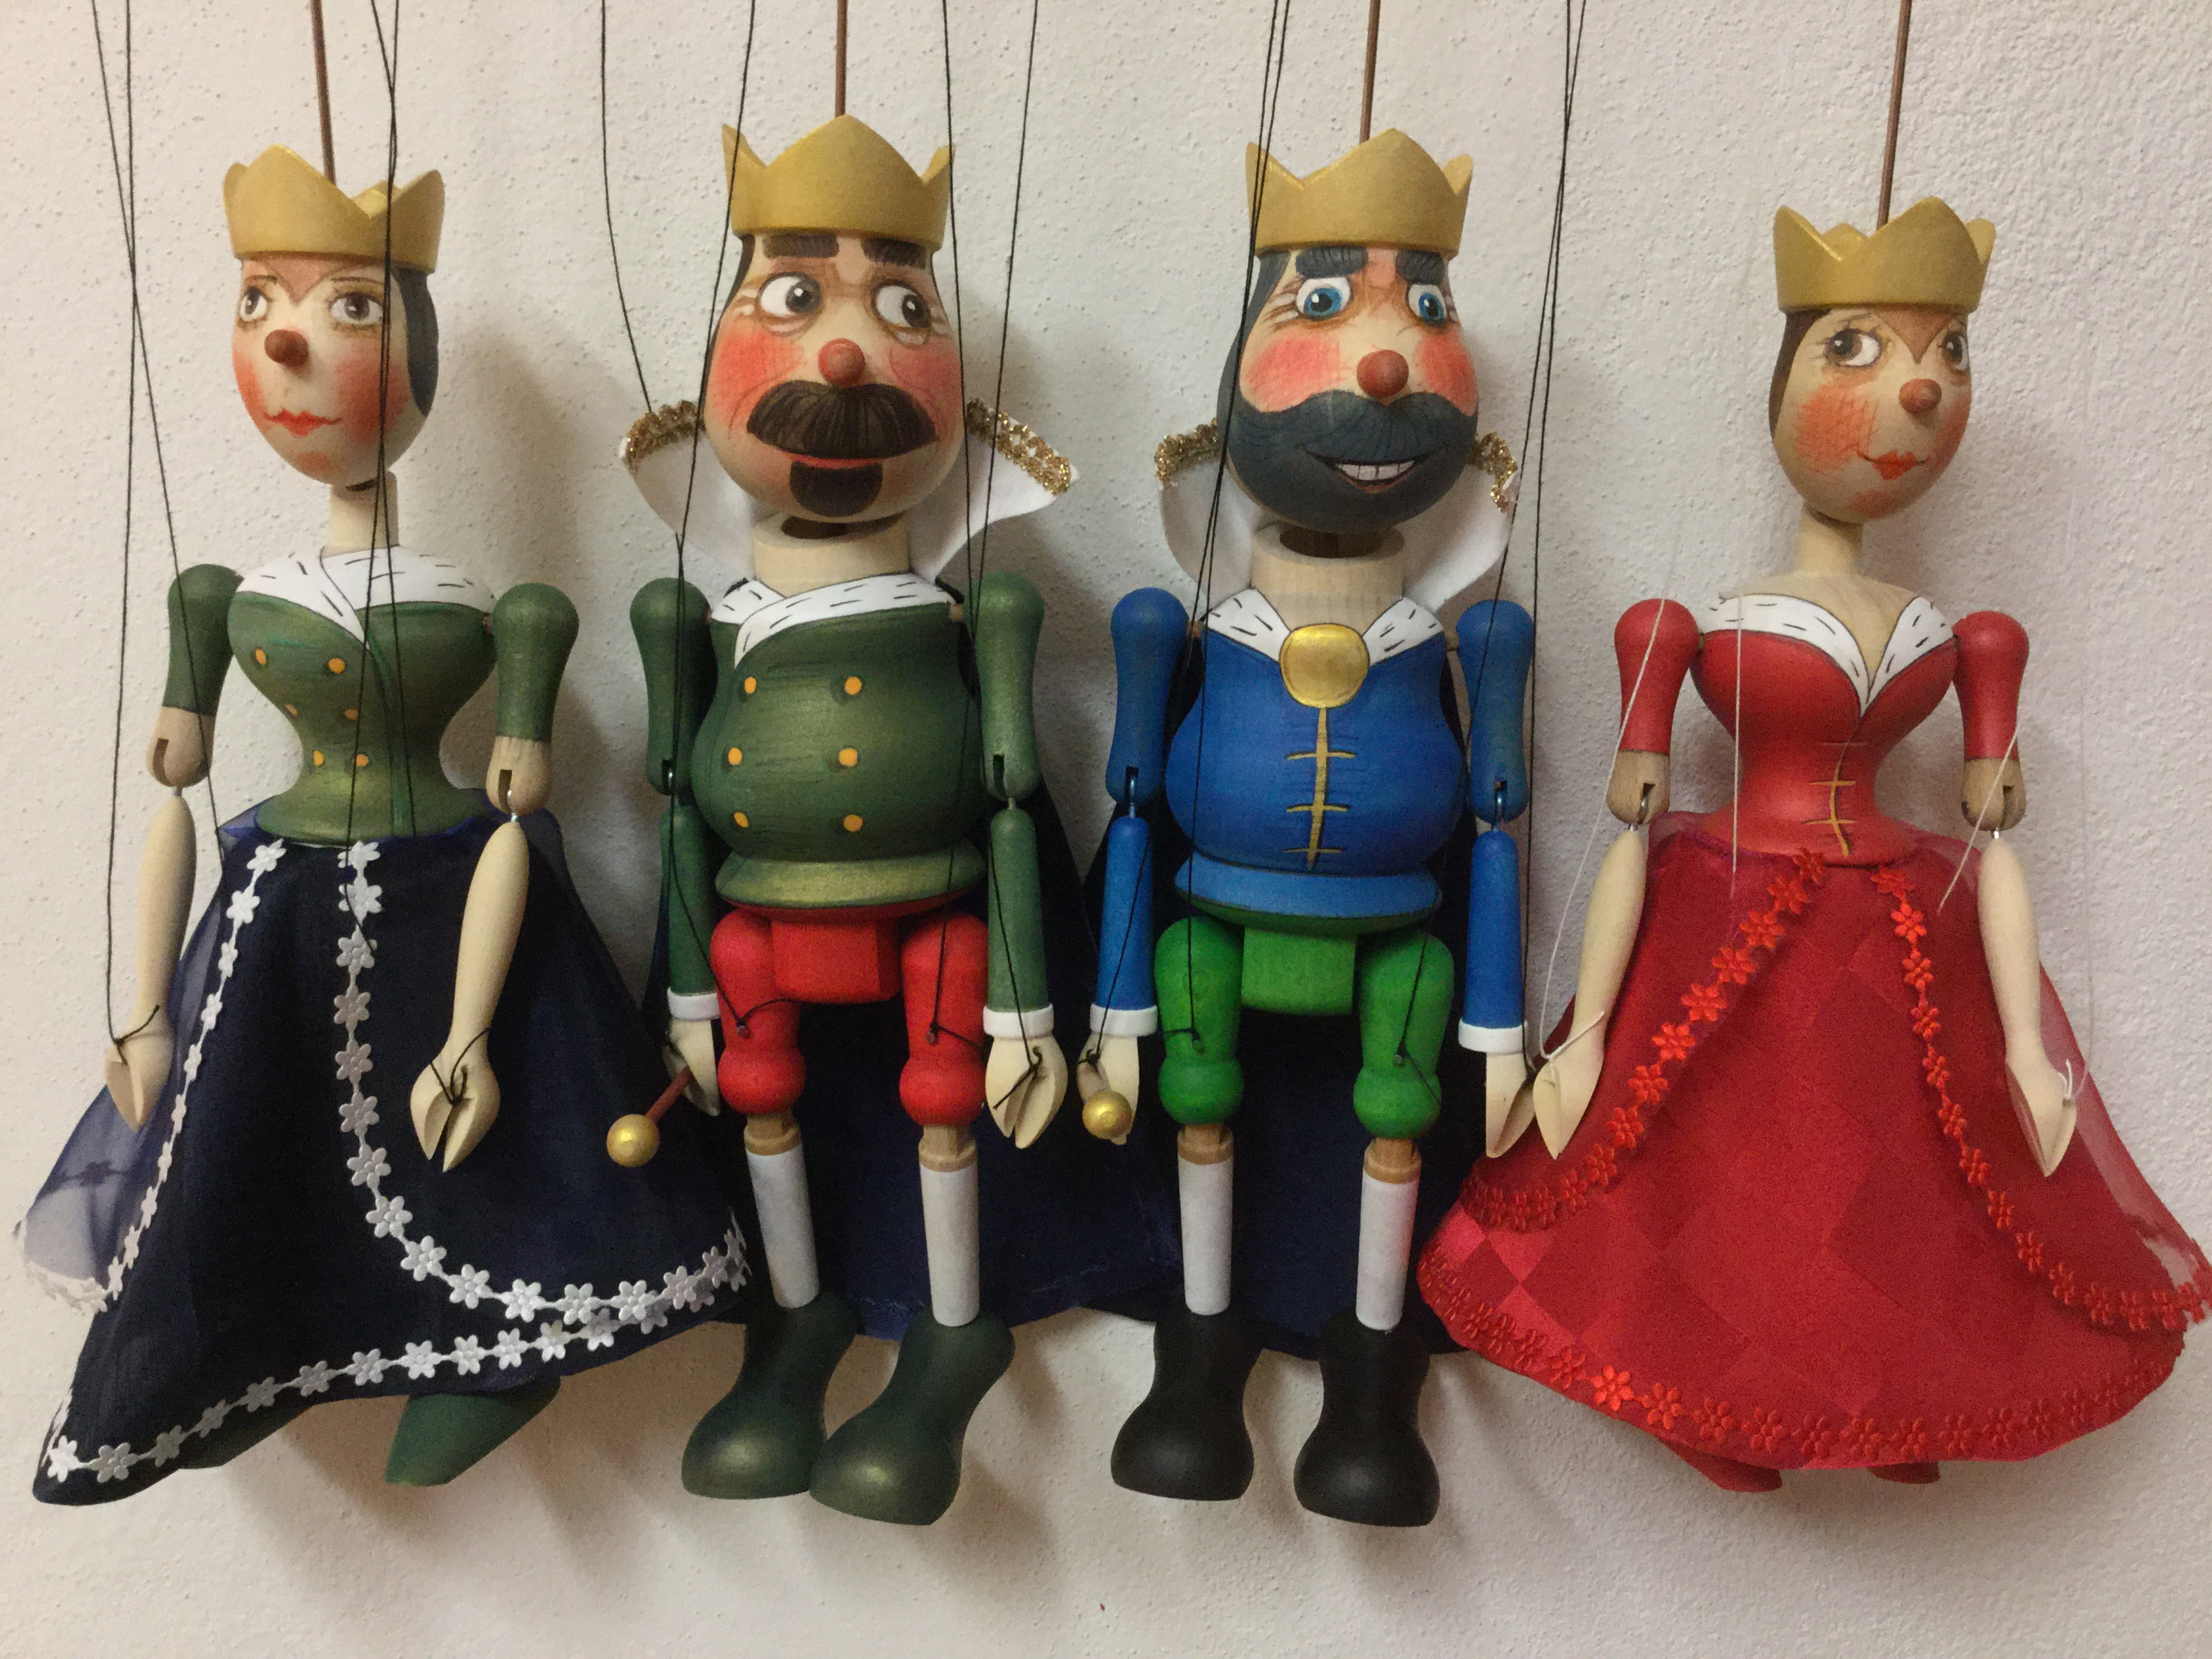 Wooden Tools Marionetas De Madera Del Tama 209 O Peque 209 O Carpintero De